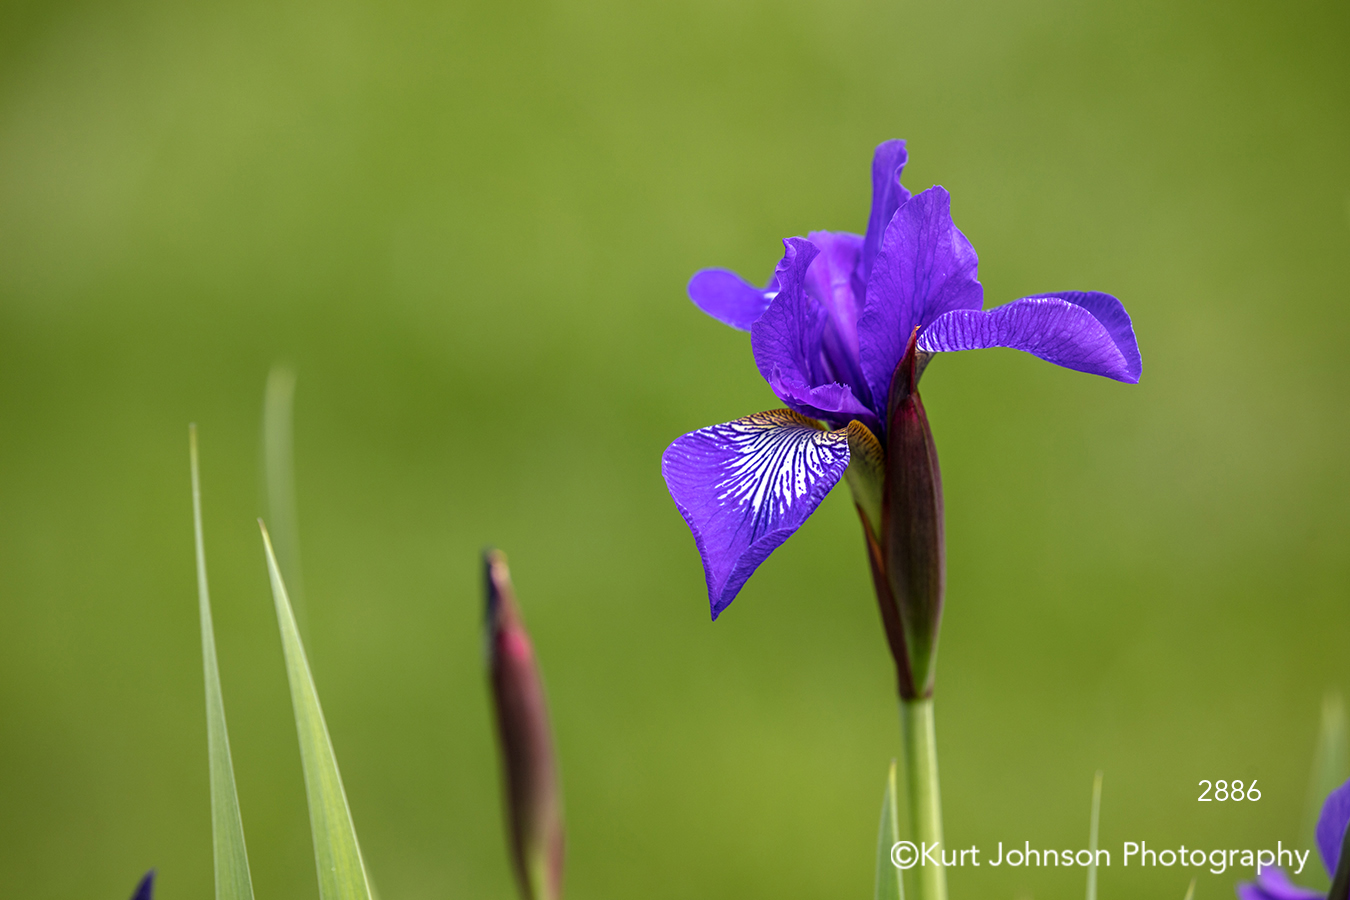 purple spring iris flower flowers green grass grasses field meadow